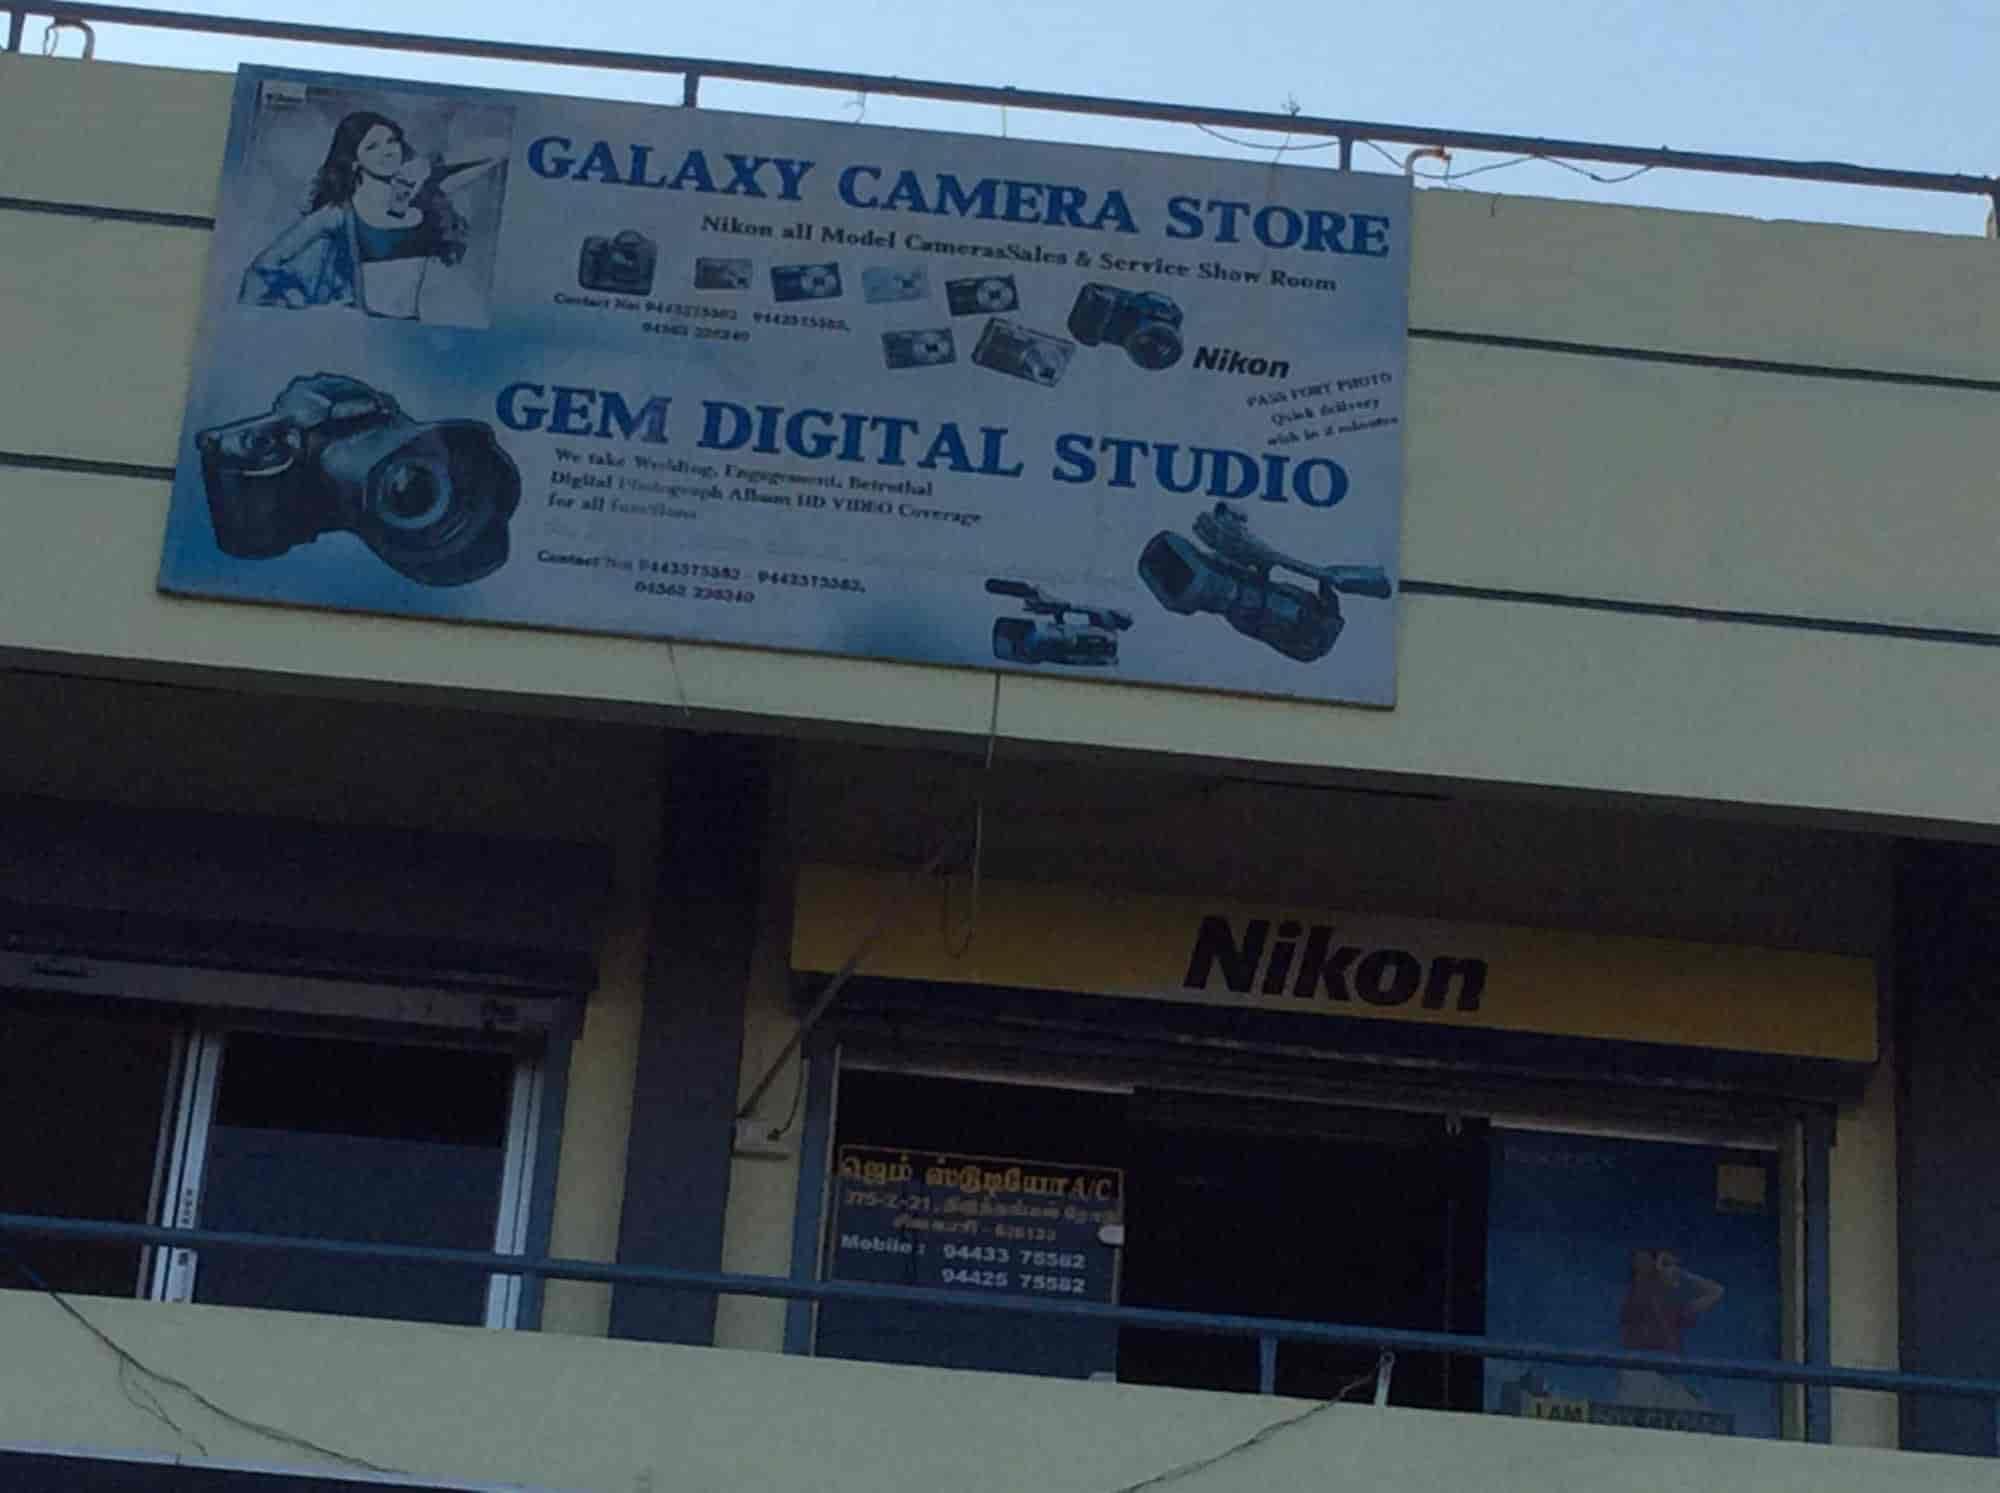 Galaxy Camera Store & Gem Digital Studio, Near Coronation Colony Bus